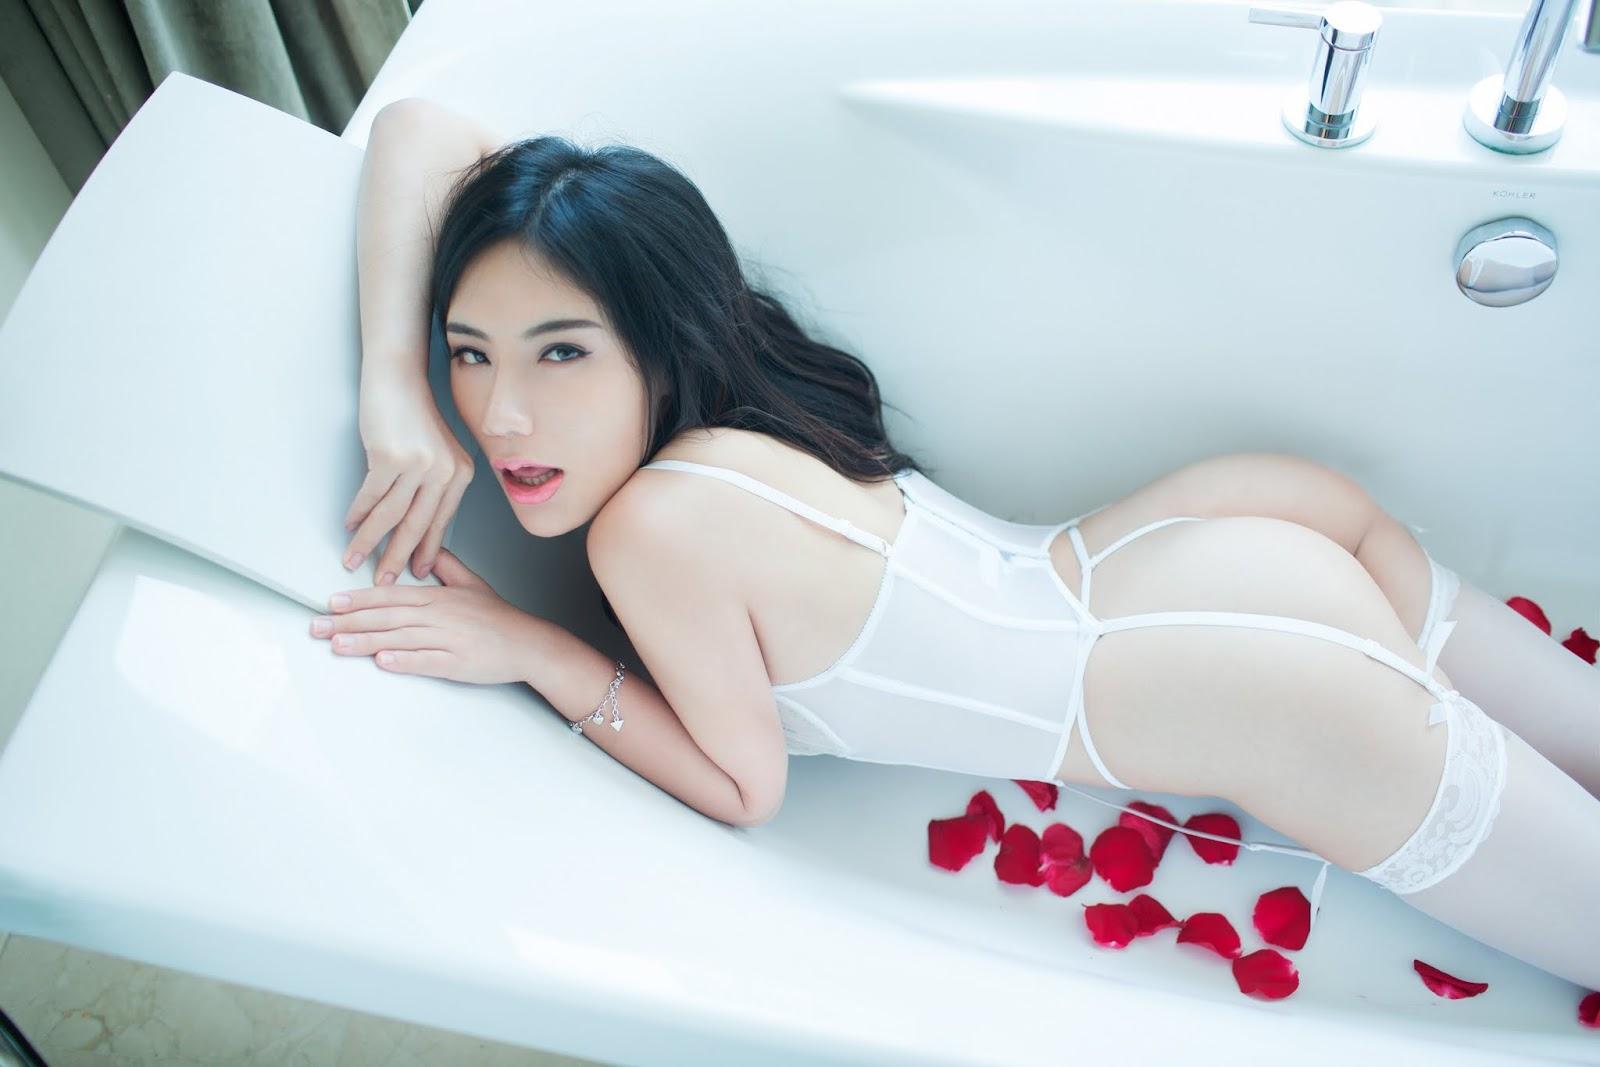 %25C2%25AC%252BO 18 - Hot Sexy Model TUIGIRL NO.46 Nude